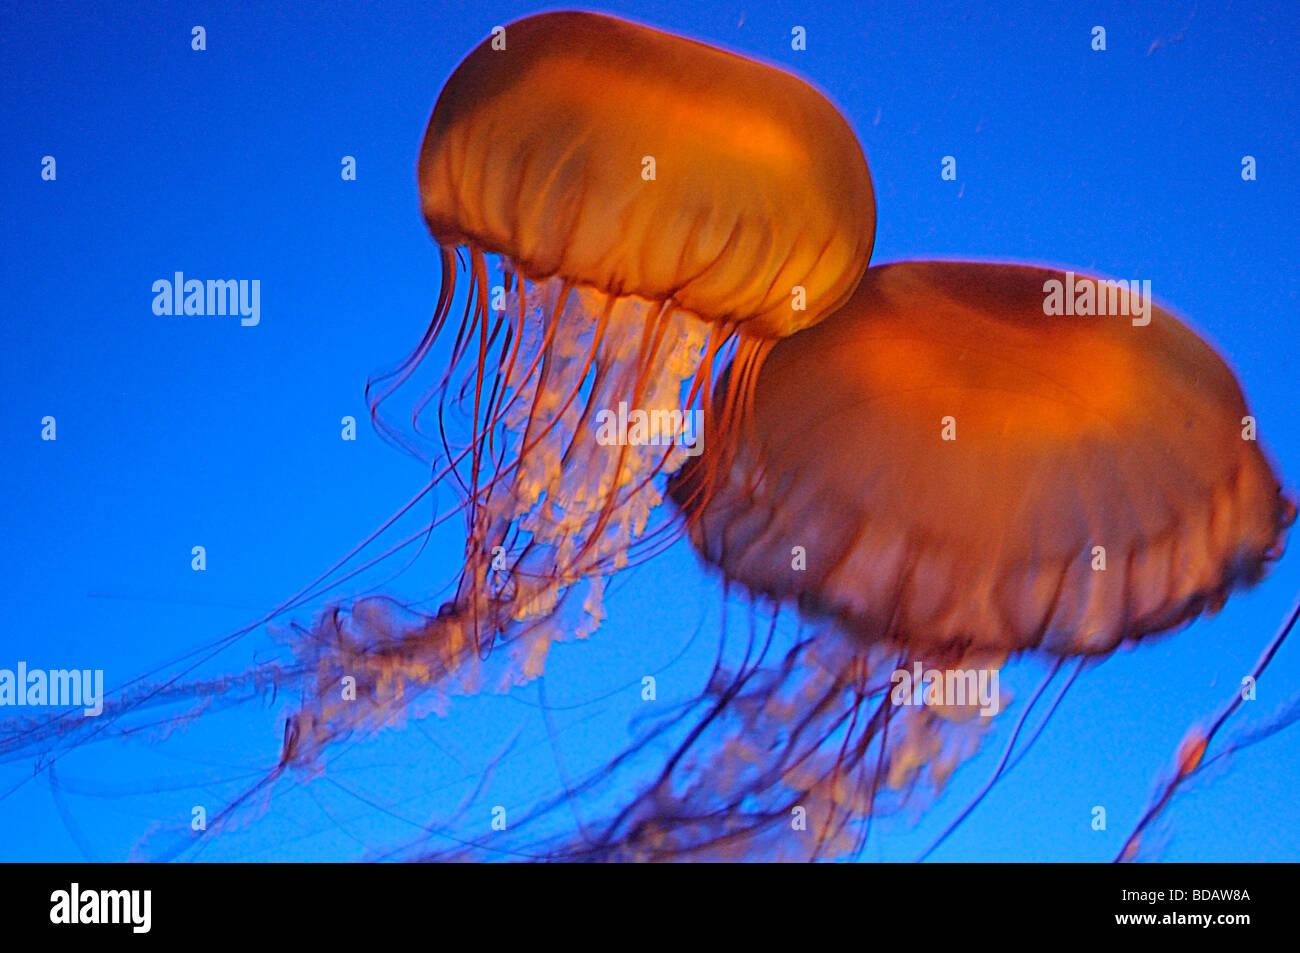 Fish aquarium vancouver - Jelly Fish At The Vancouver Aquarium In Stanley Park Vancouver Canada